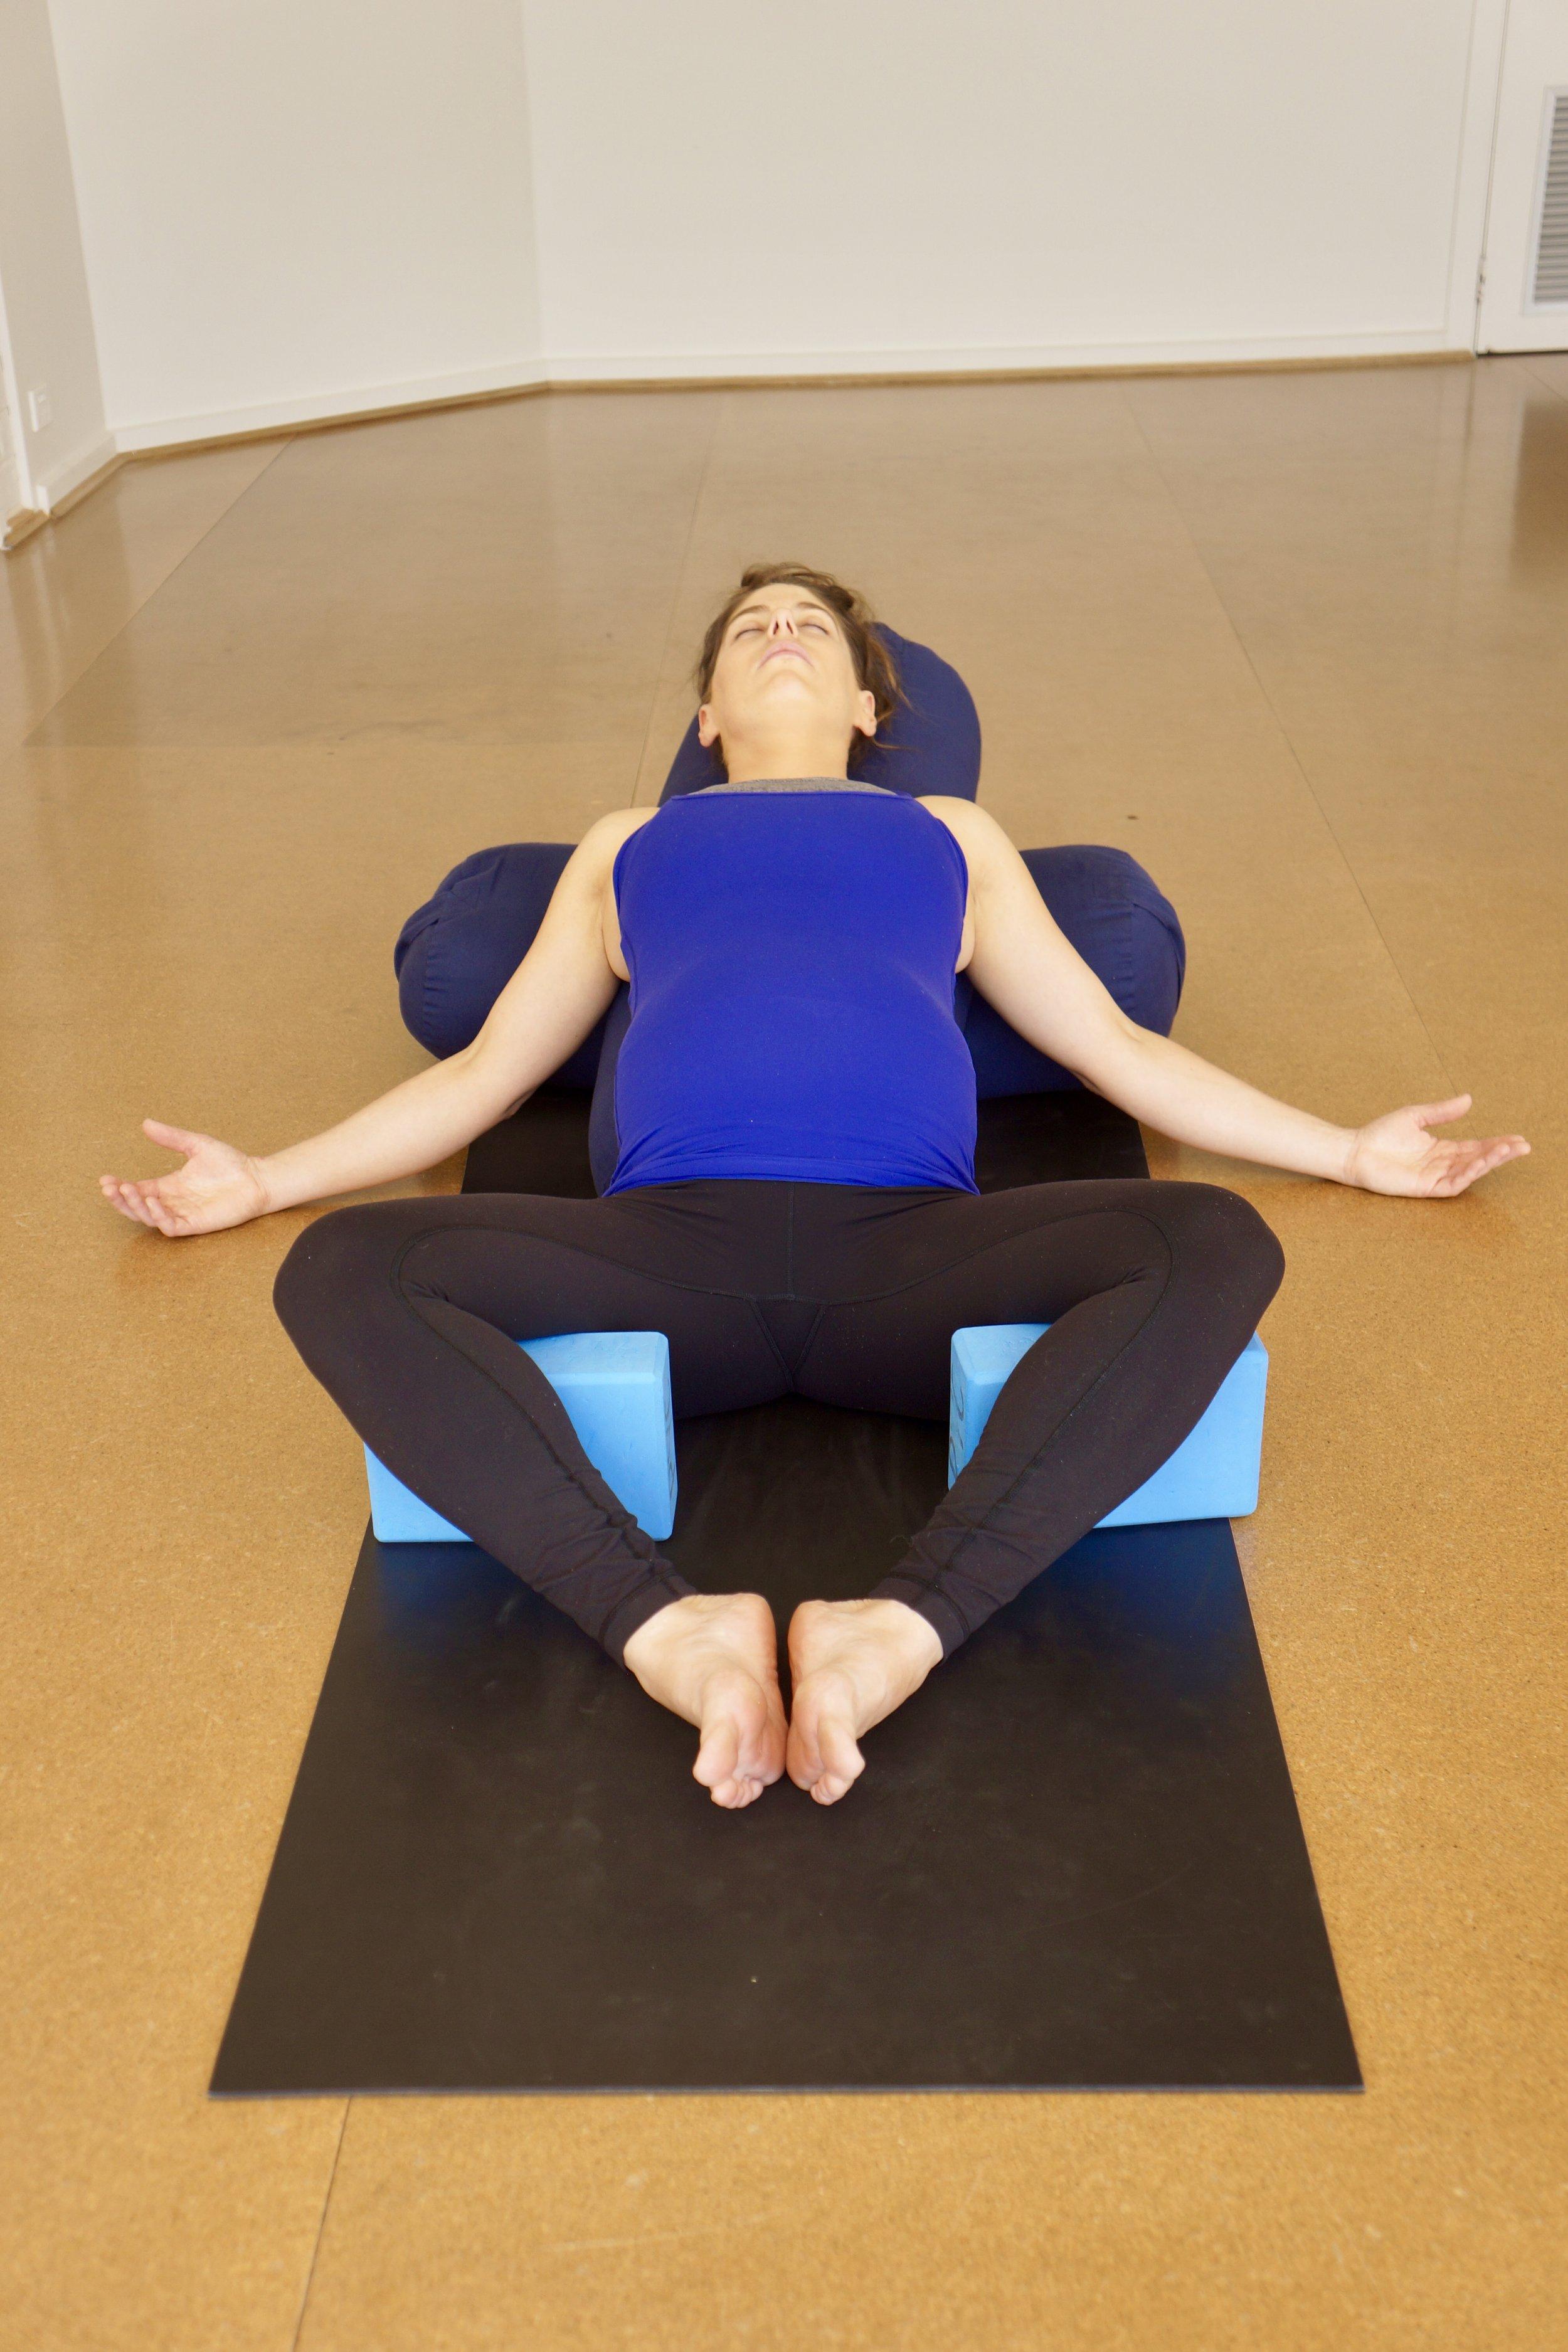 Arm chair pose